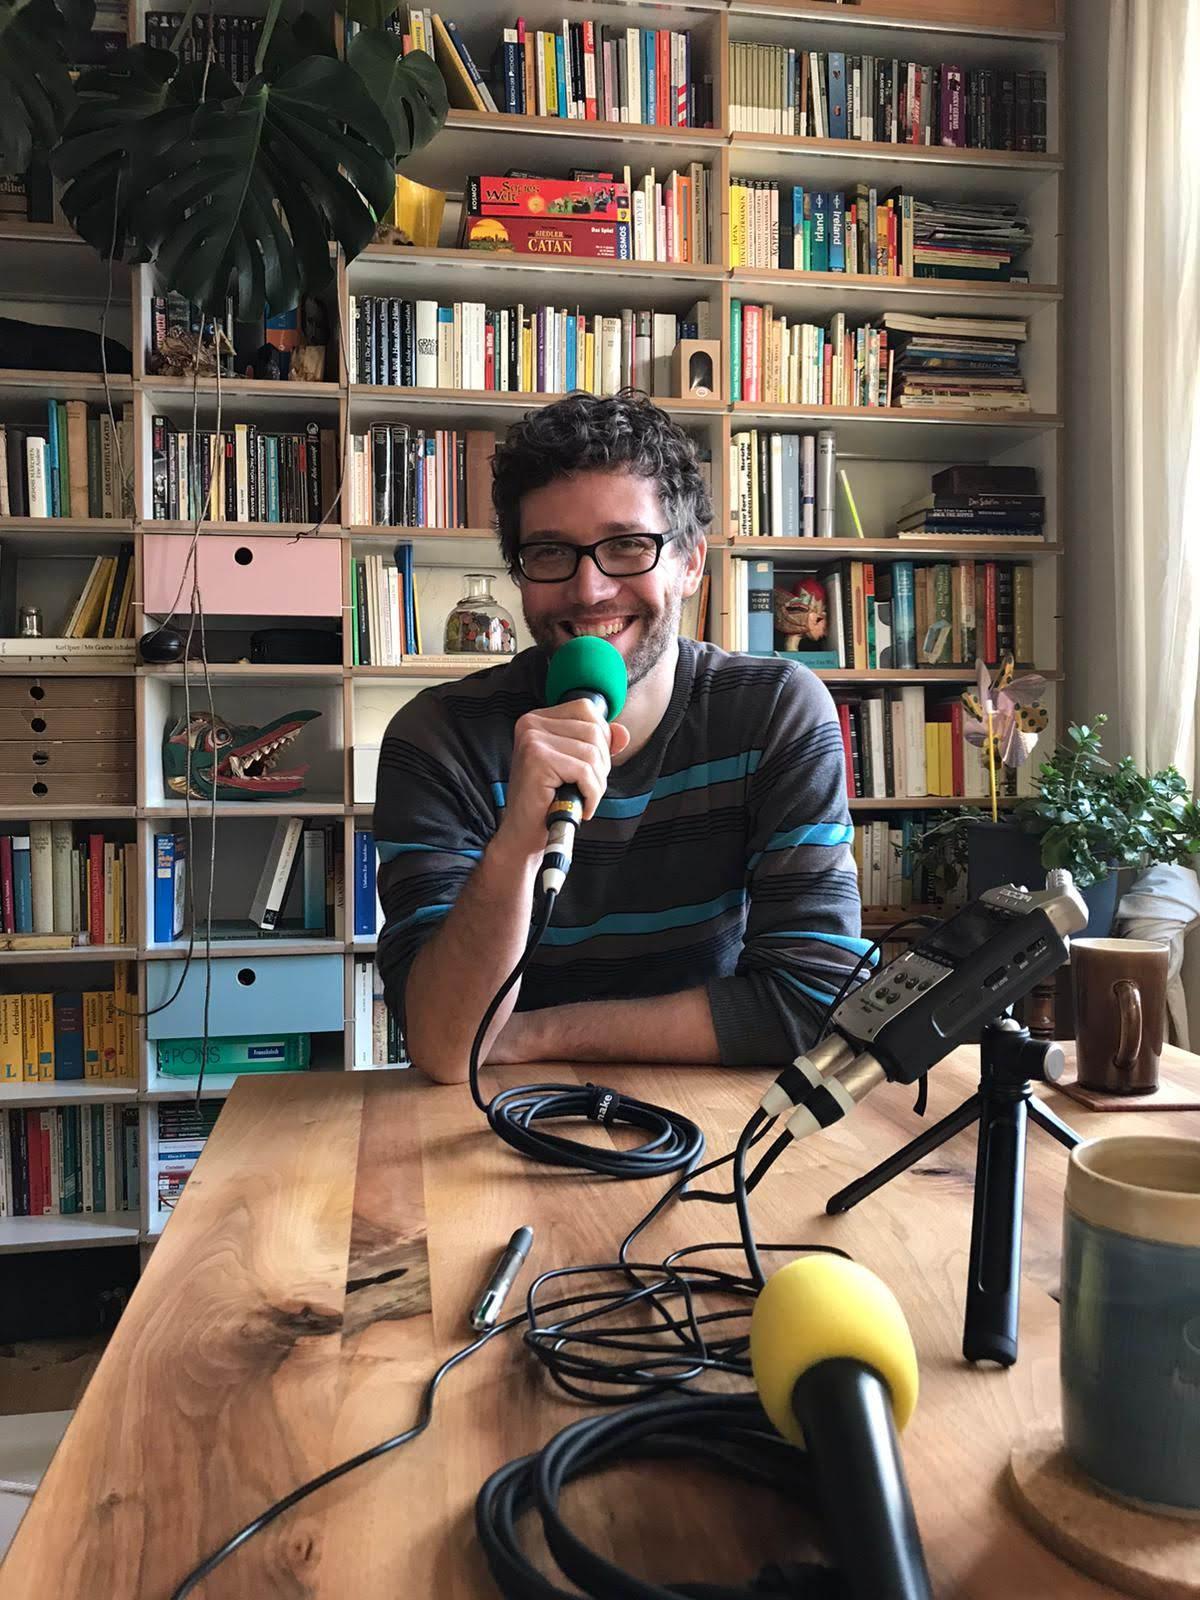 FAMILIENARCHITEKT Mein Podcast